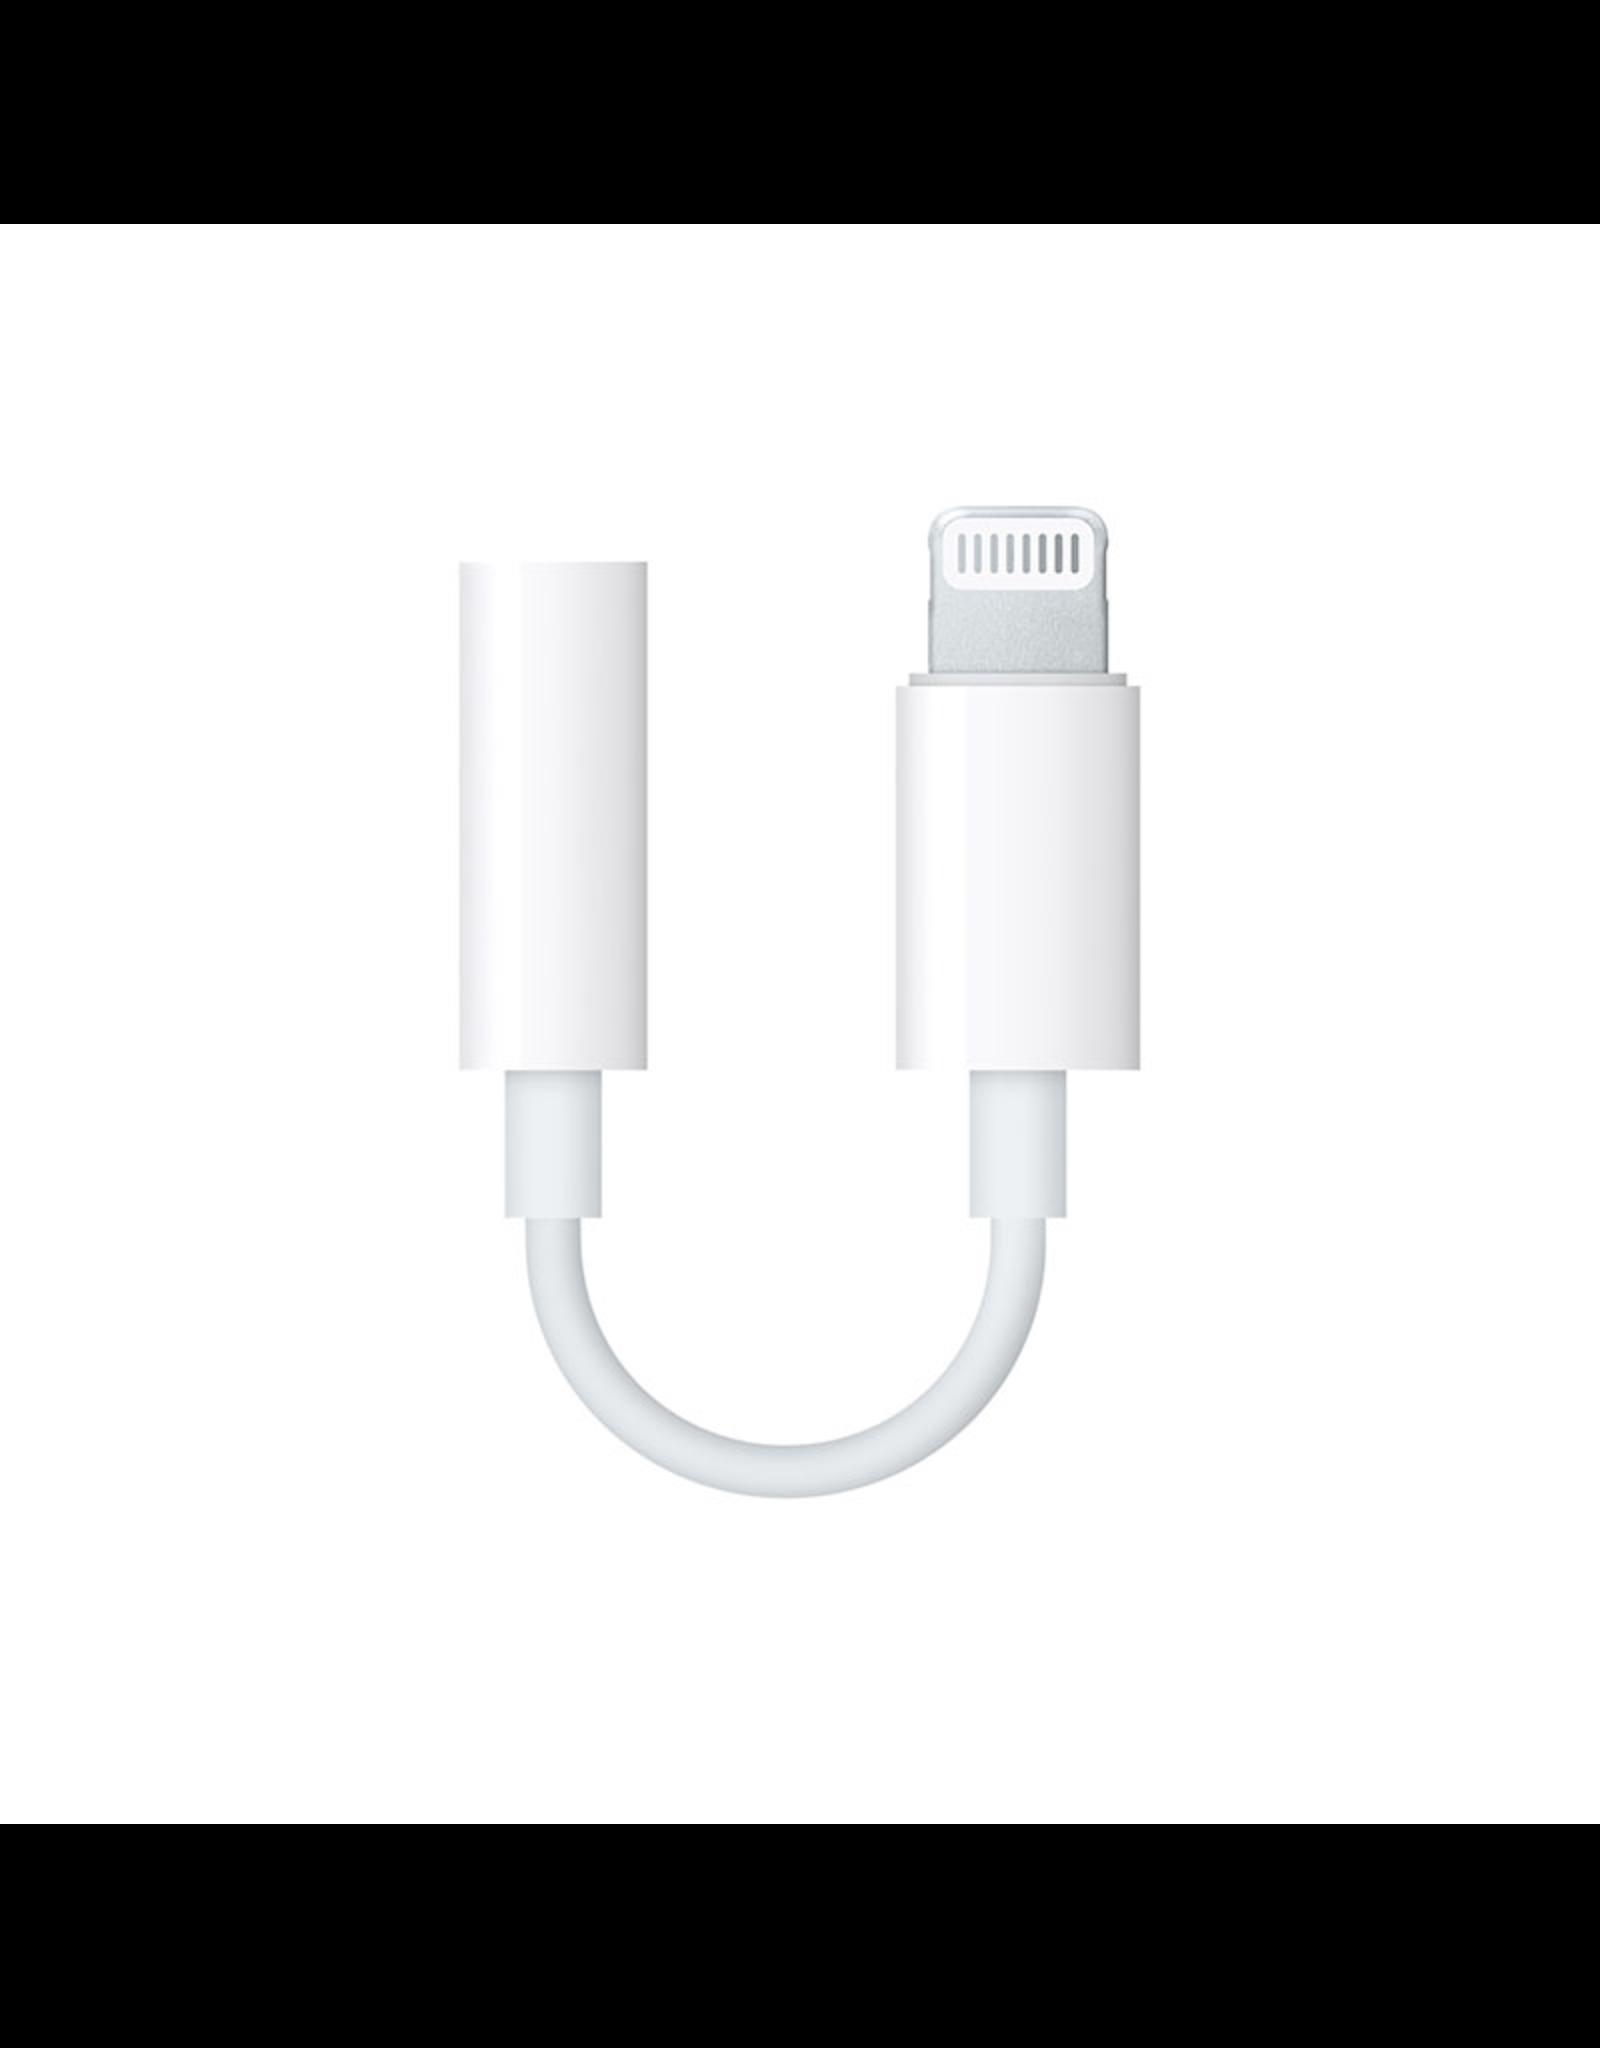 Apple Apple Lightning to 3.5mm Headphone Jack Adapter